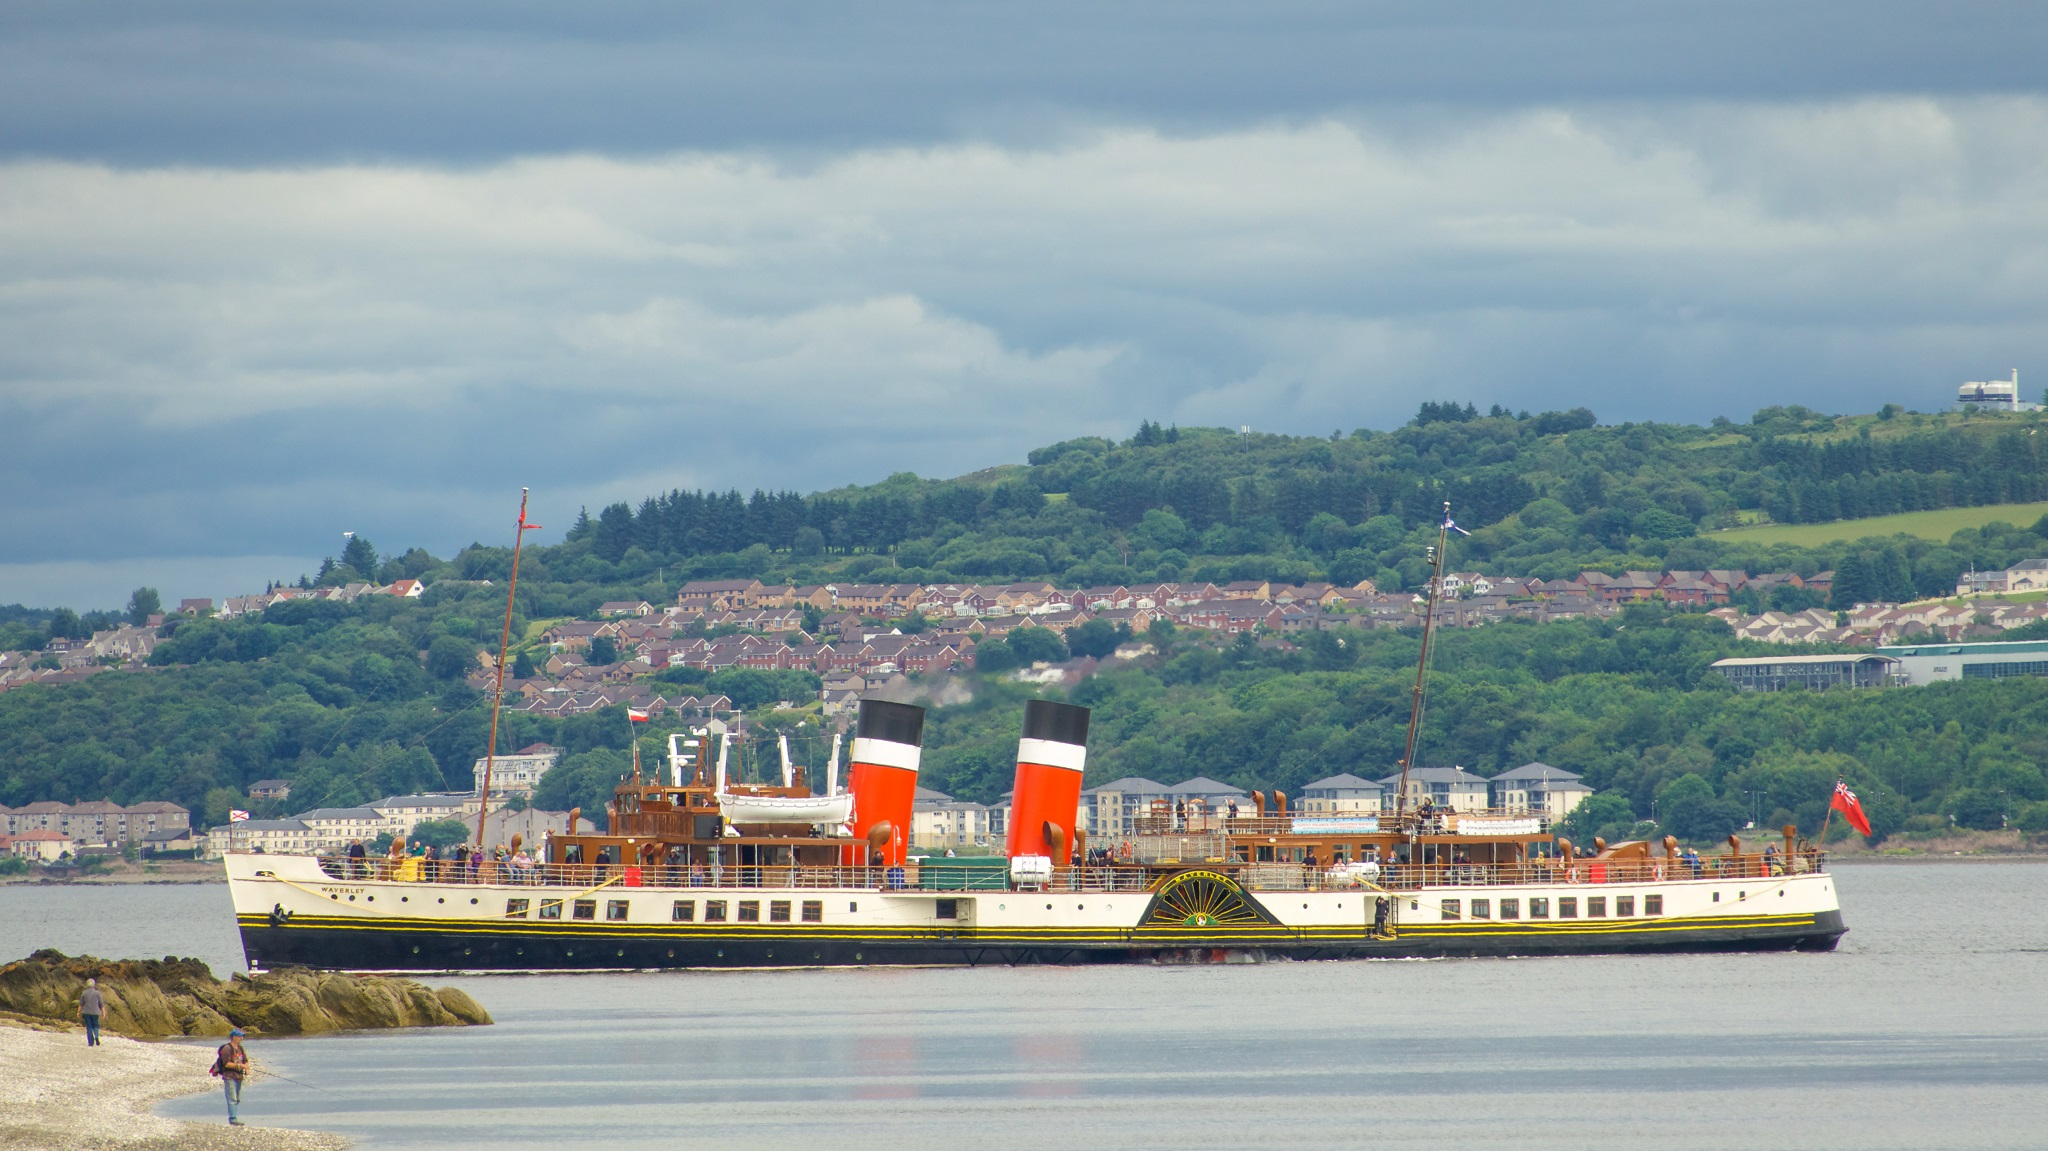 Waverley en el Clyde